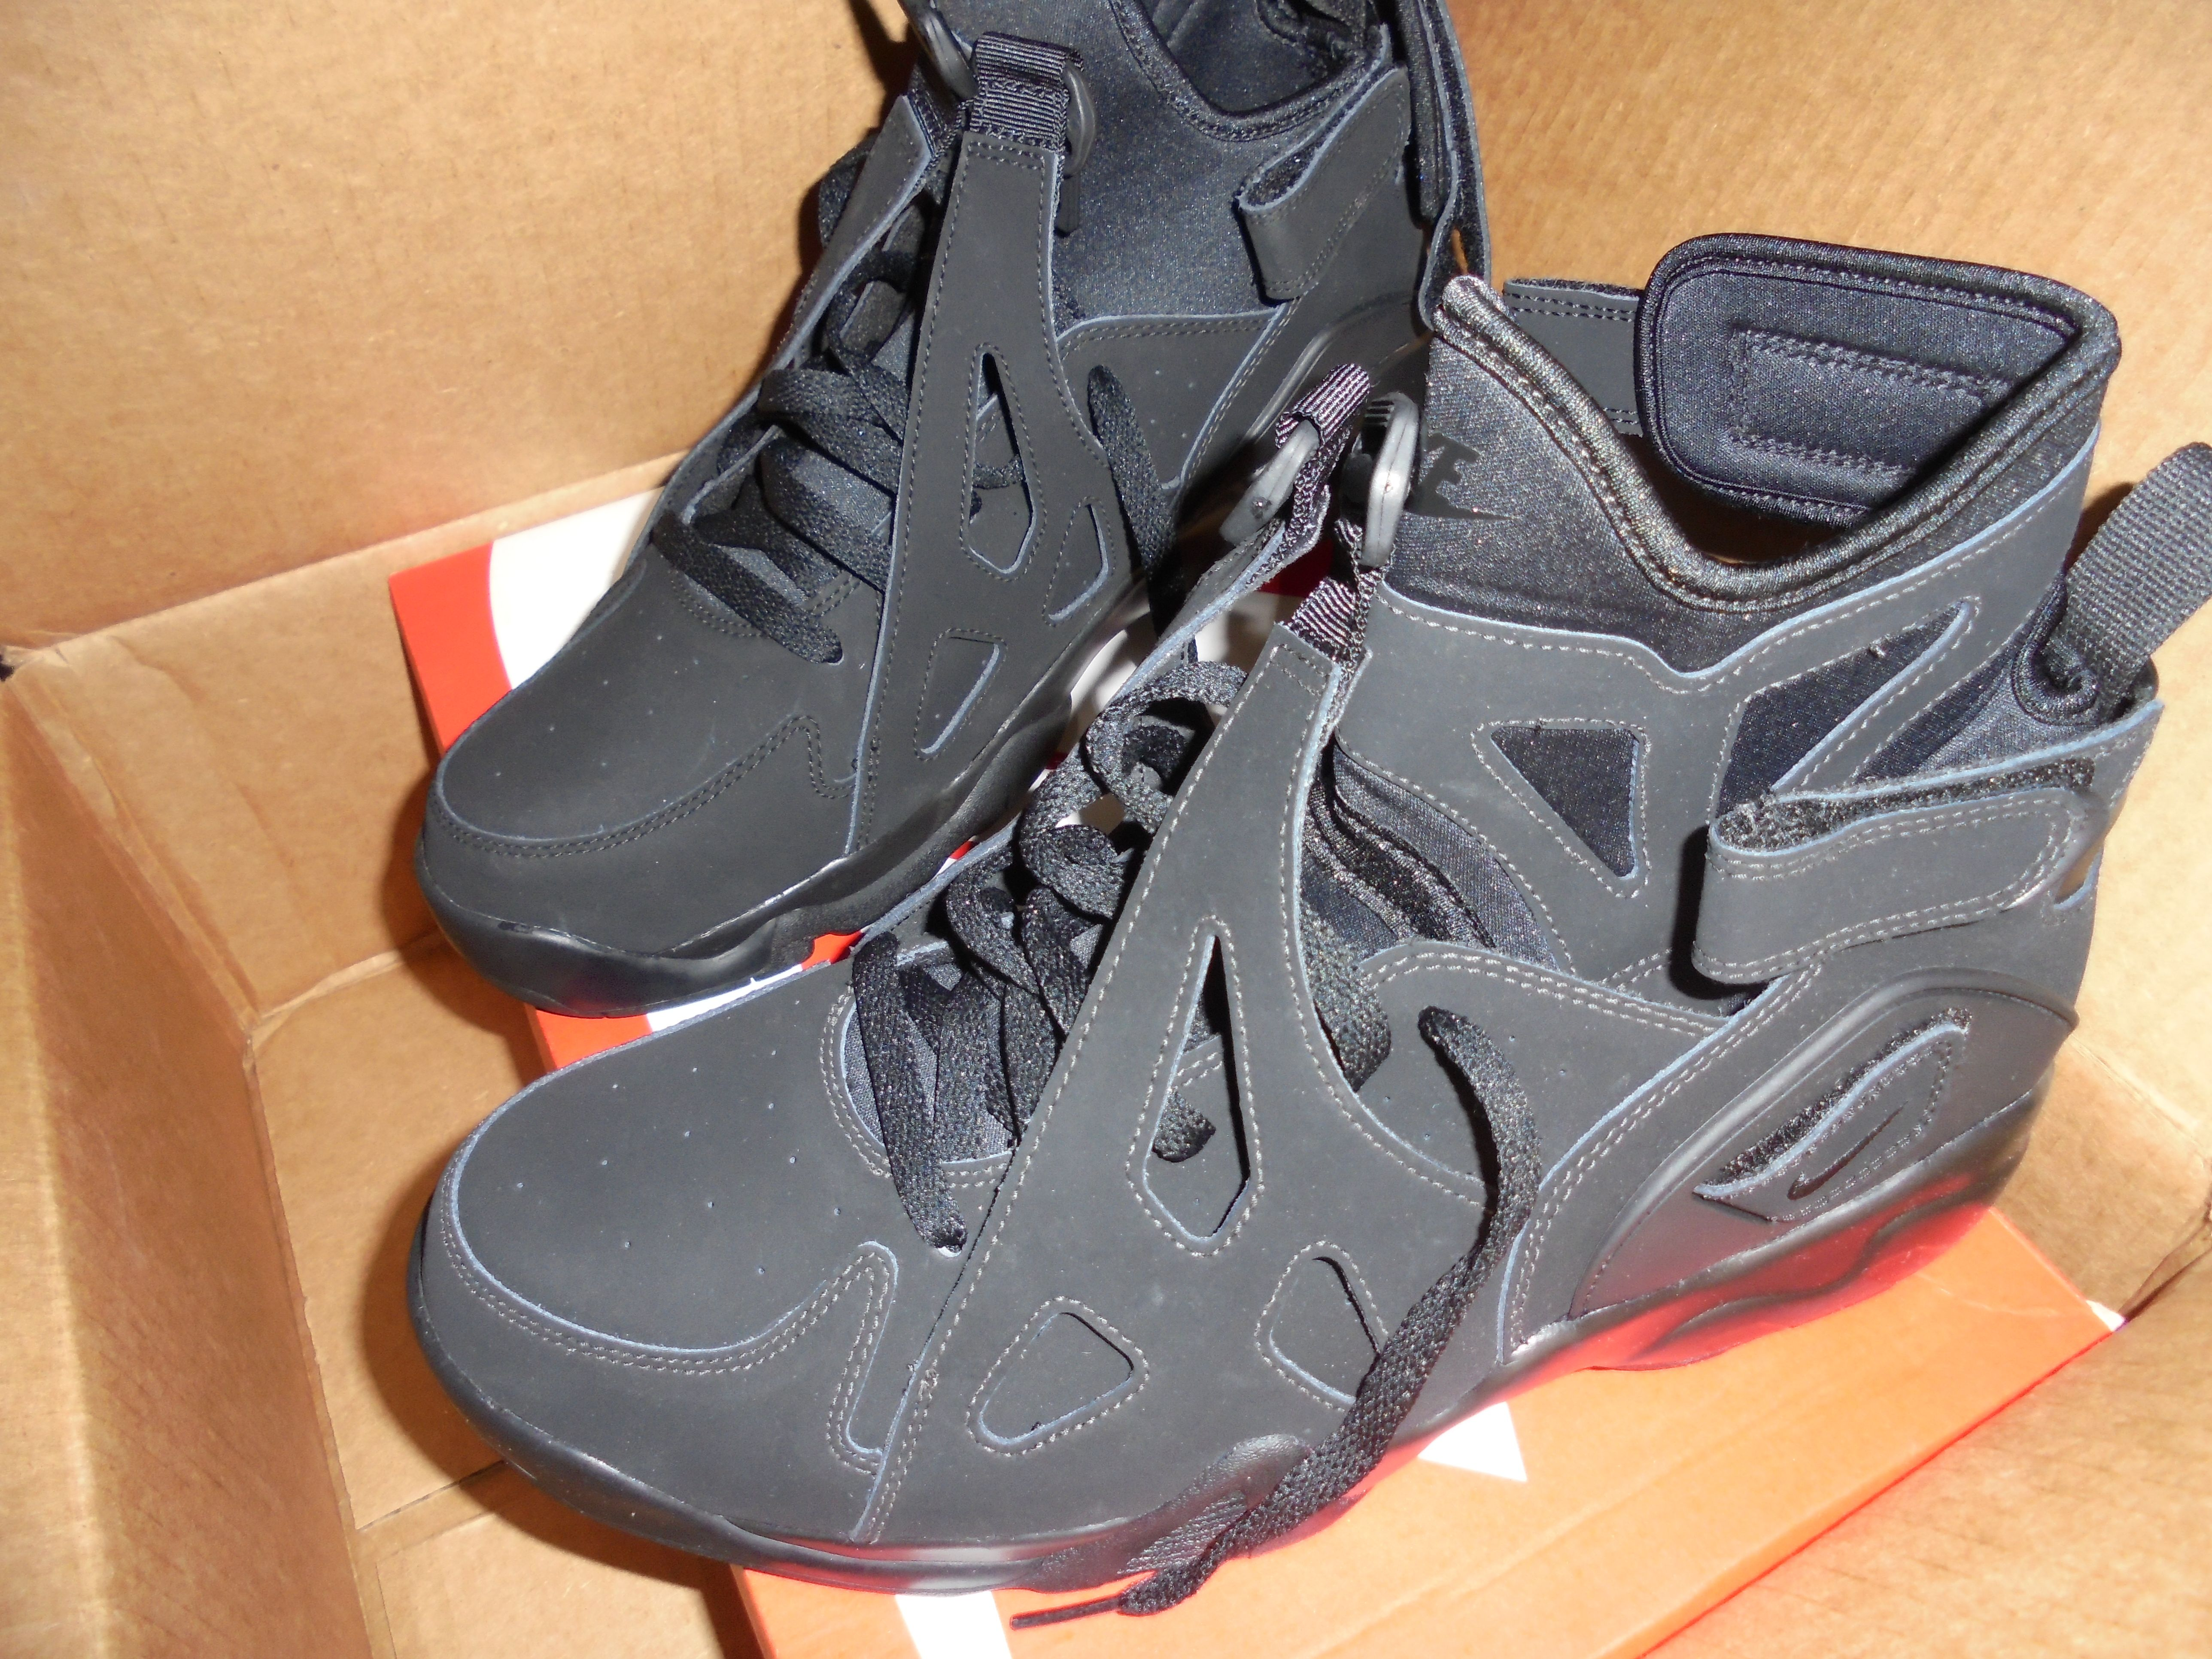 #NikeAirUnlimited in #BlackSuede  - https://drewrynewsnetwork.com/forum/shoe-reviews/sneaker-reviews